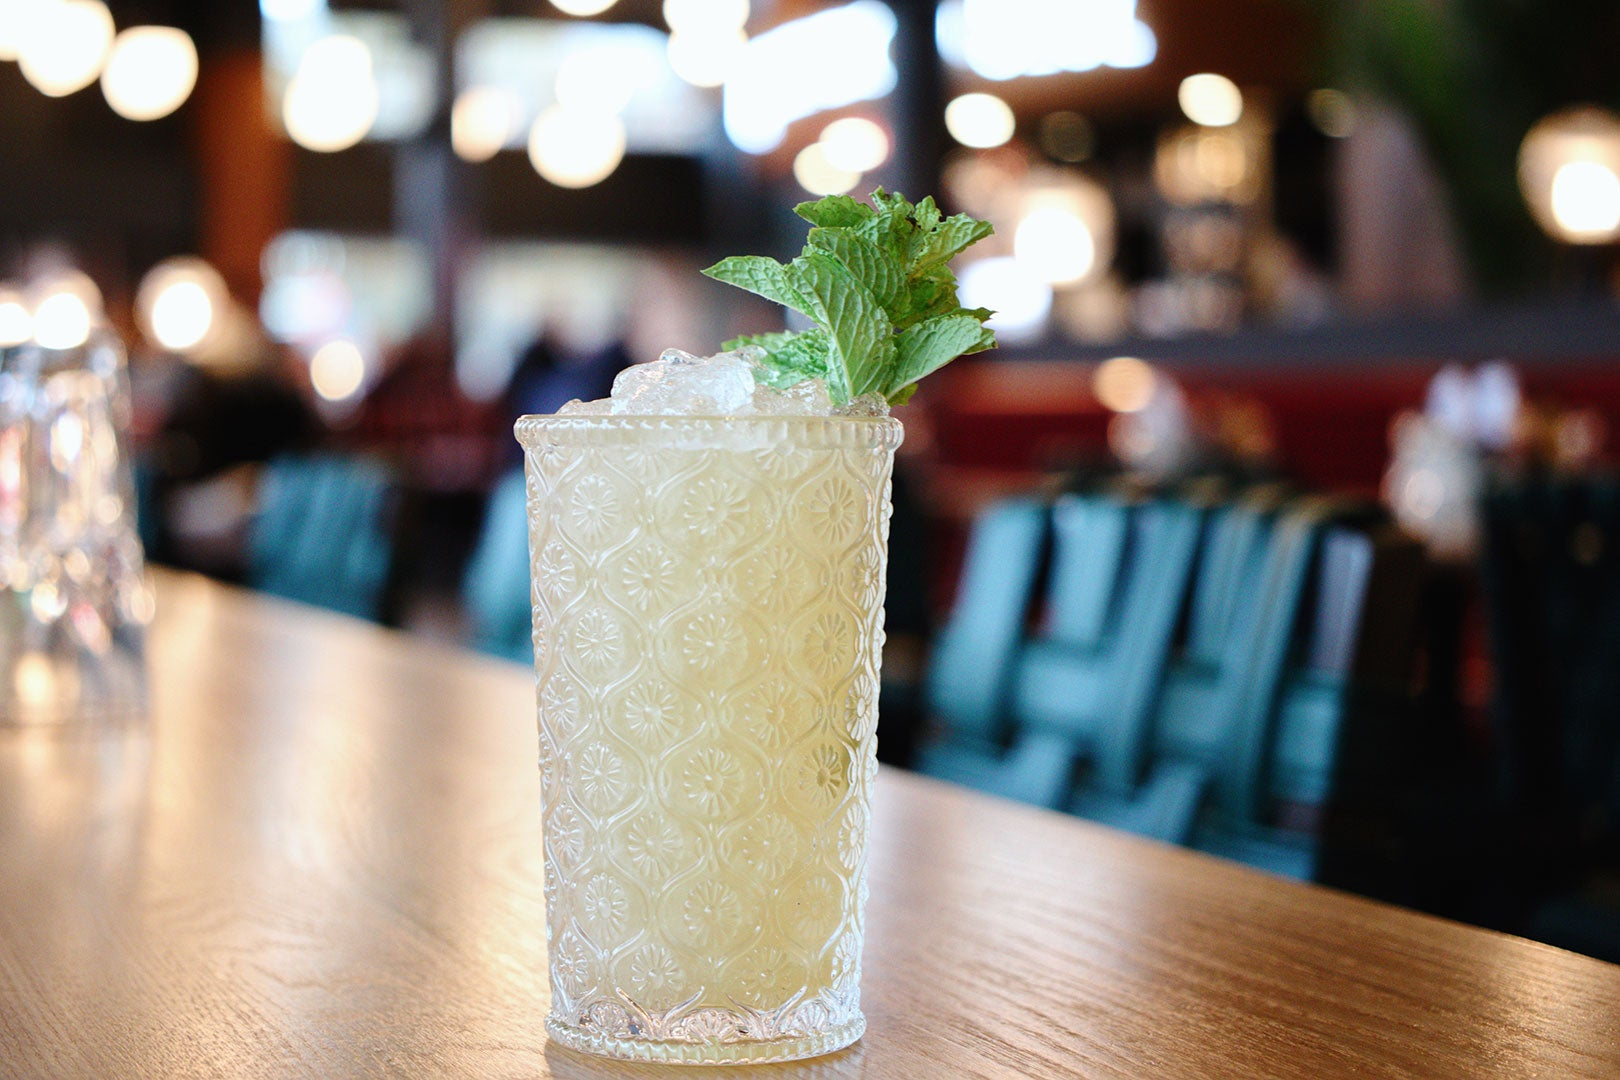 The Porch Smash cocktail